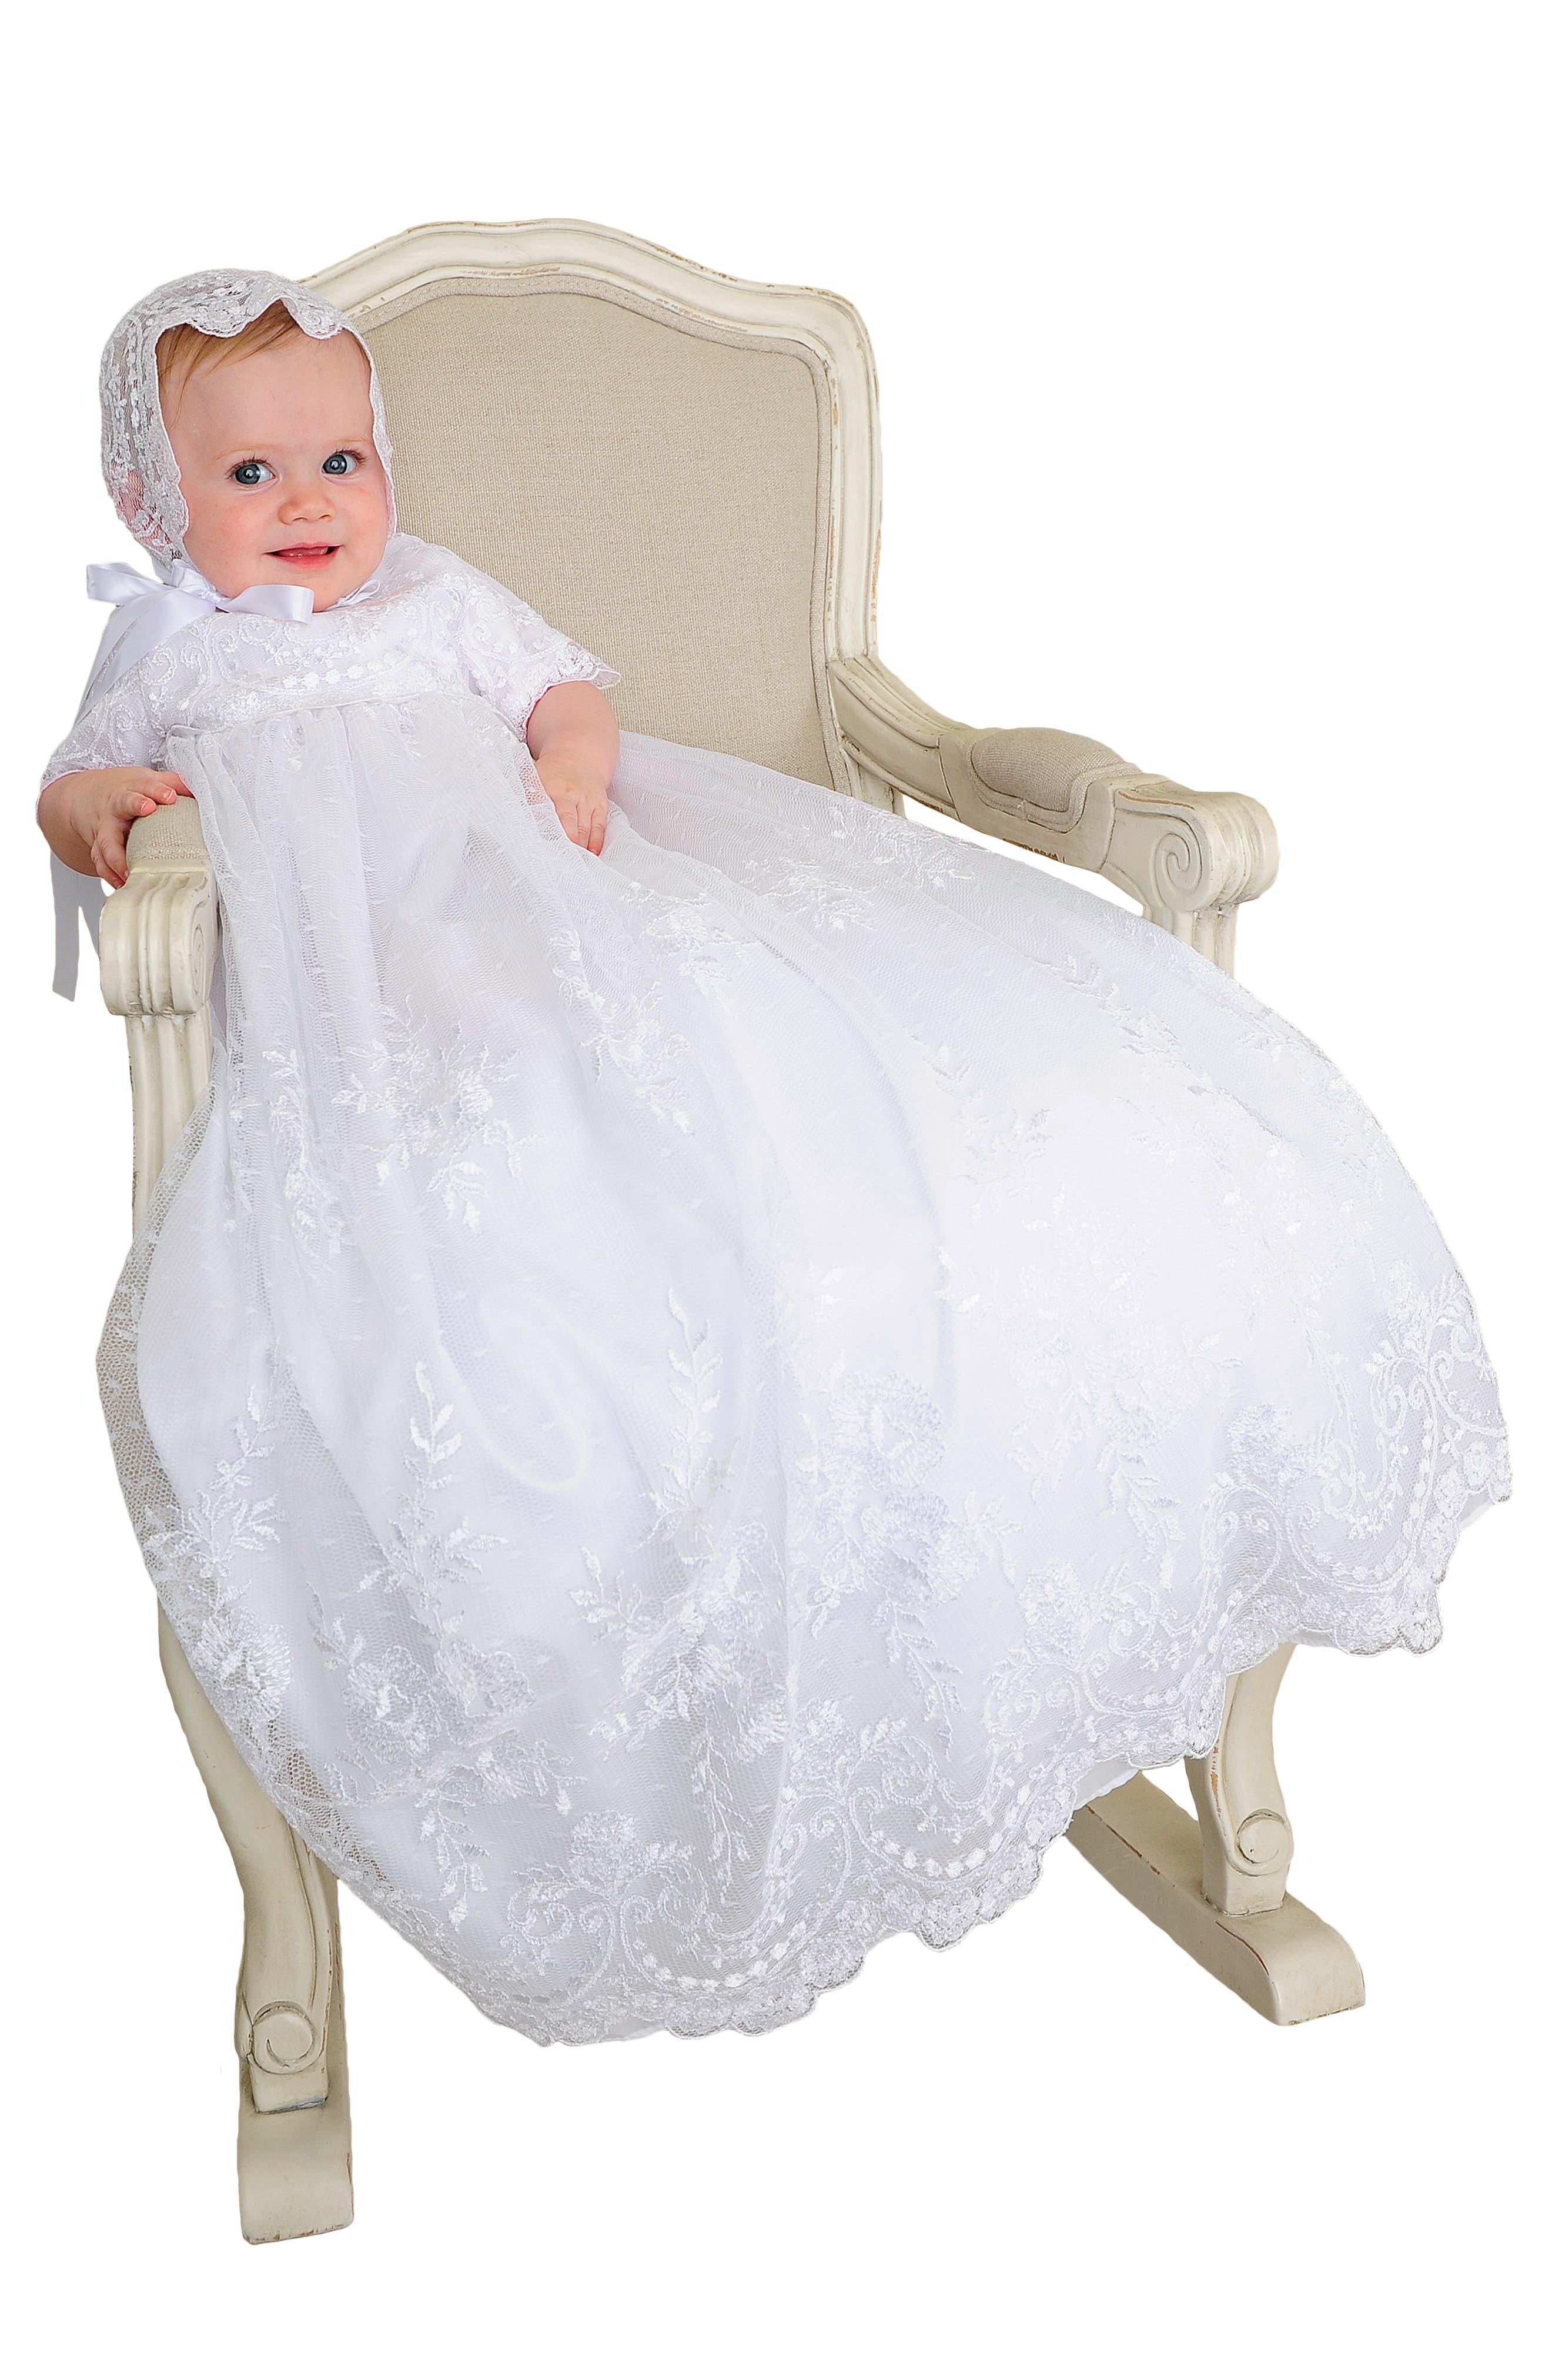 LITTLE THINGS MEAN A LOT, Christening Gown, Shawl, Slip & Bonnet Set, Alternate thumbnail 6, color, WHITE